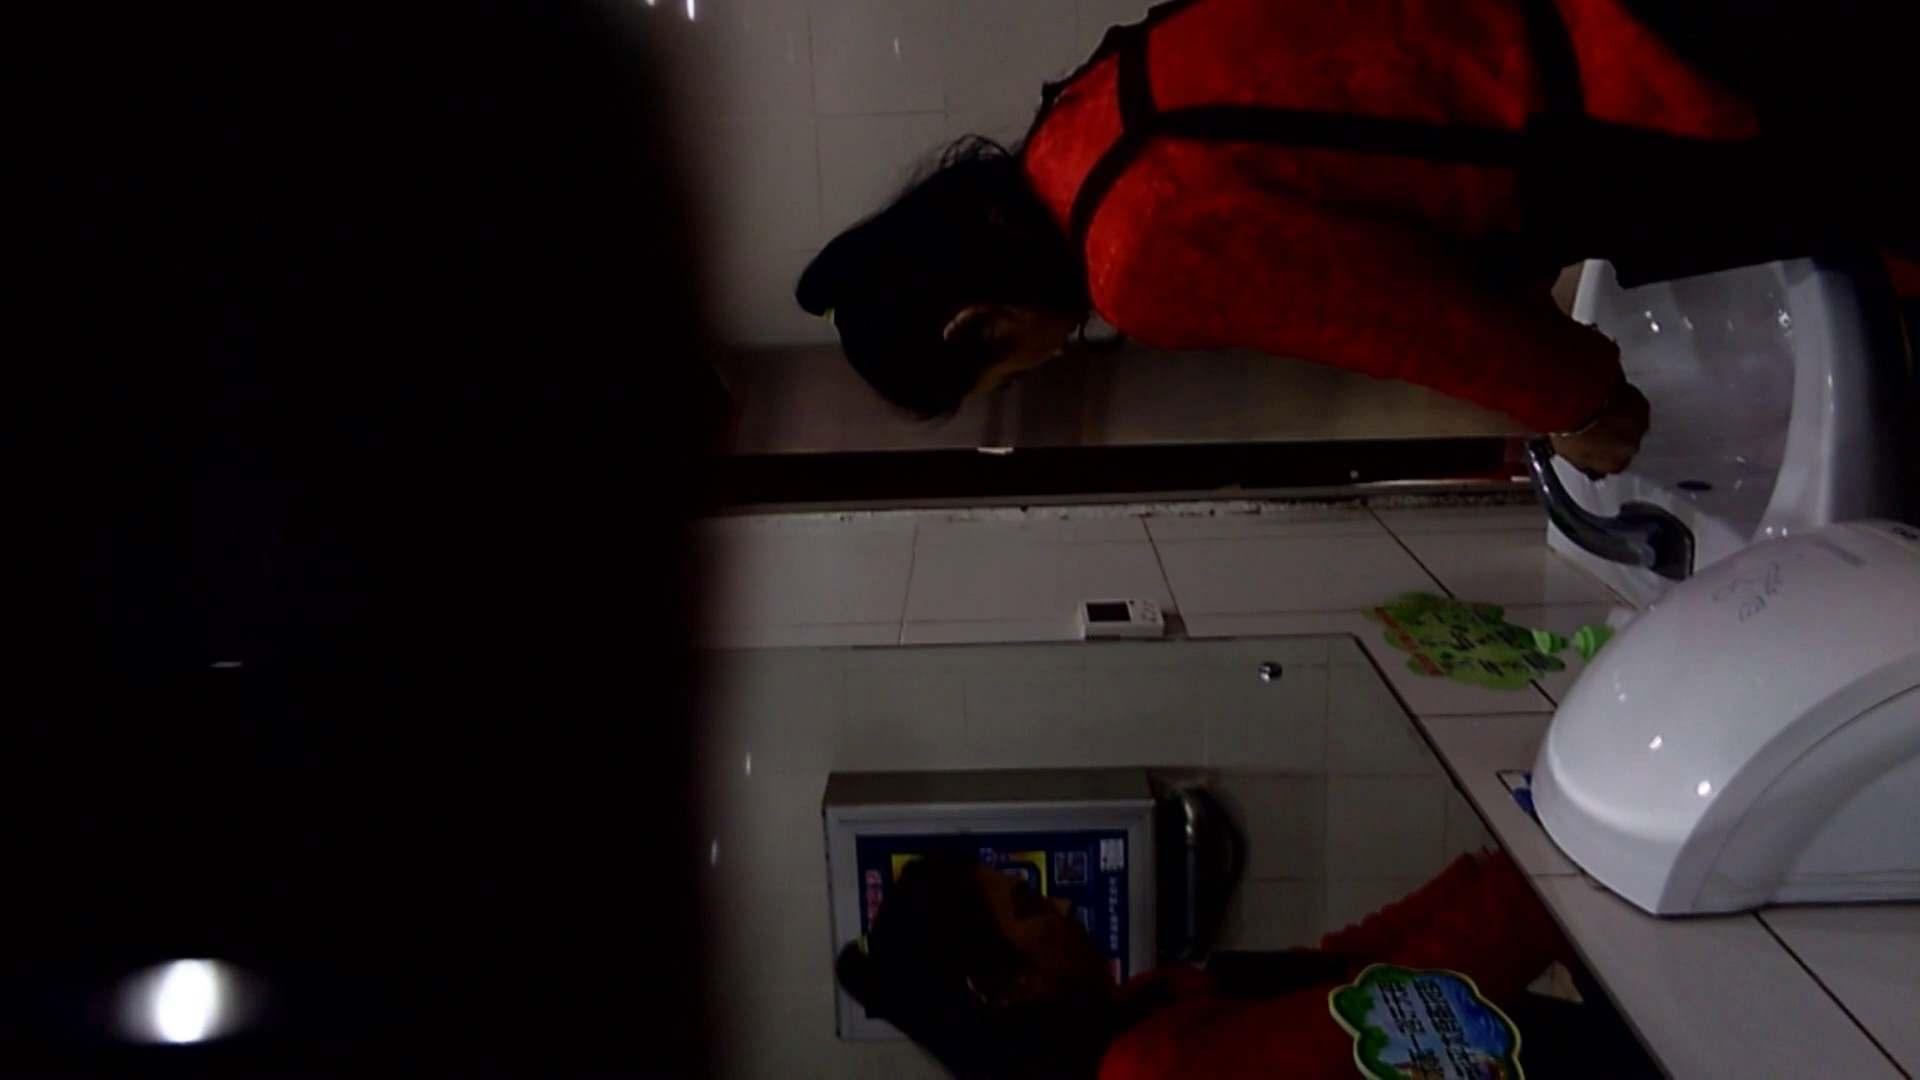 芸術大学ガチ潜入盗撮 JD盗撮 美女の洗面所の秘密 Vol.105 丸見え SEX無修正画像 83枚 75